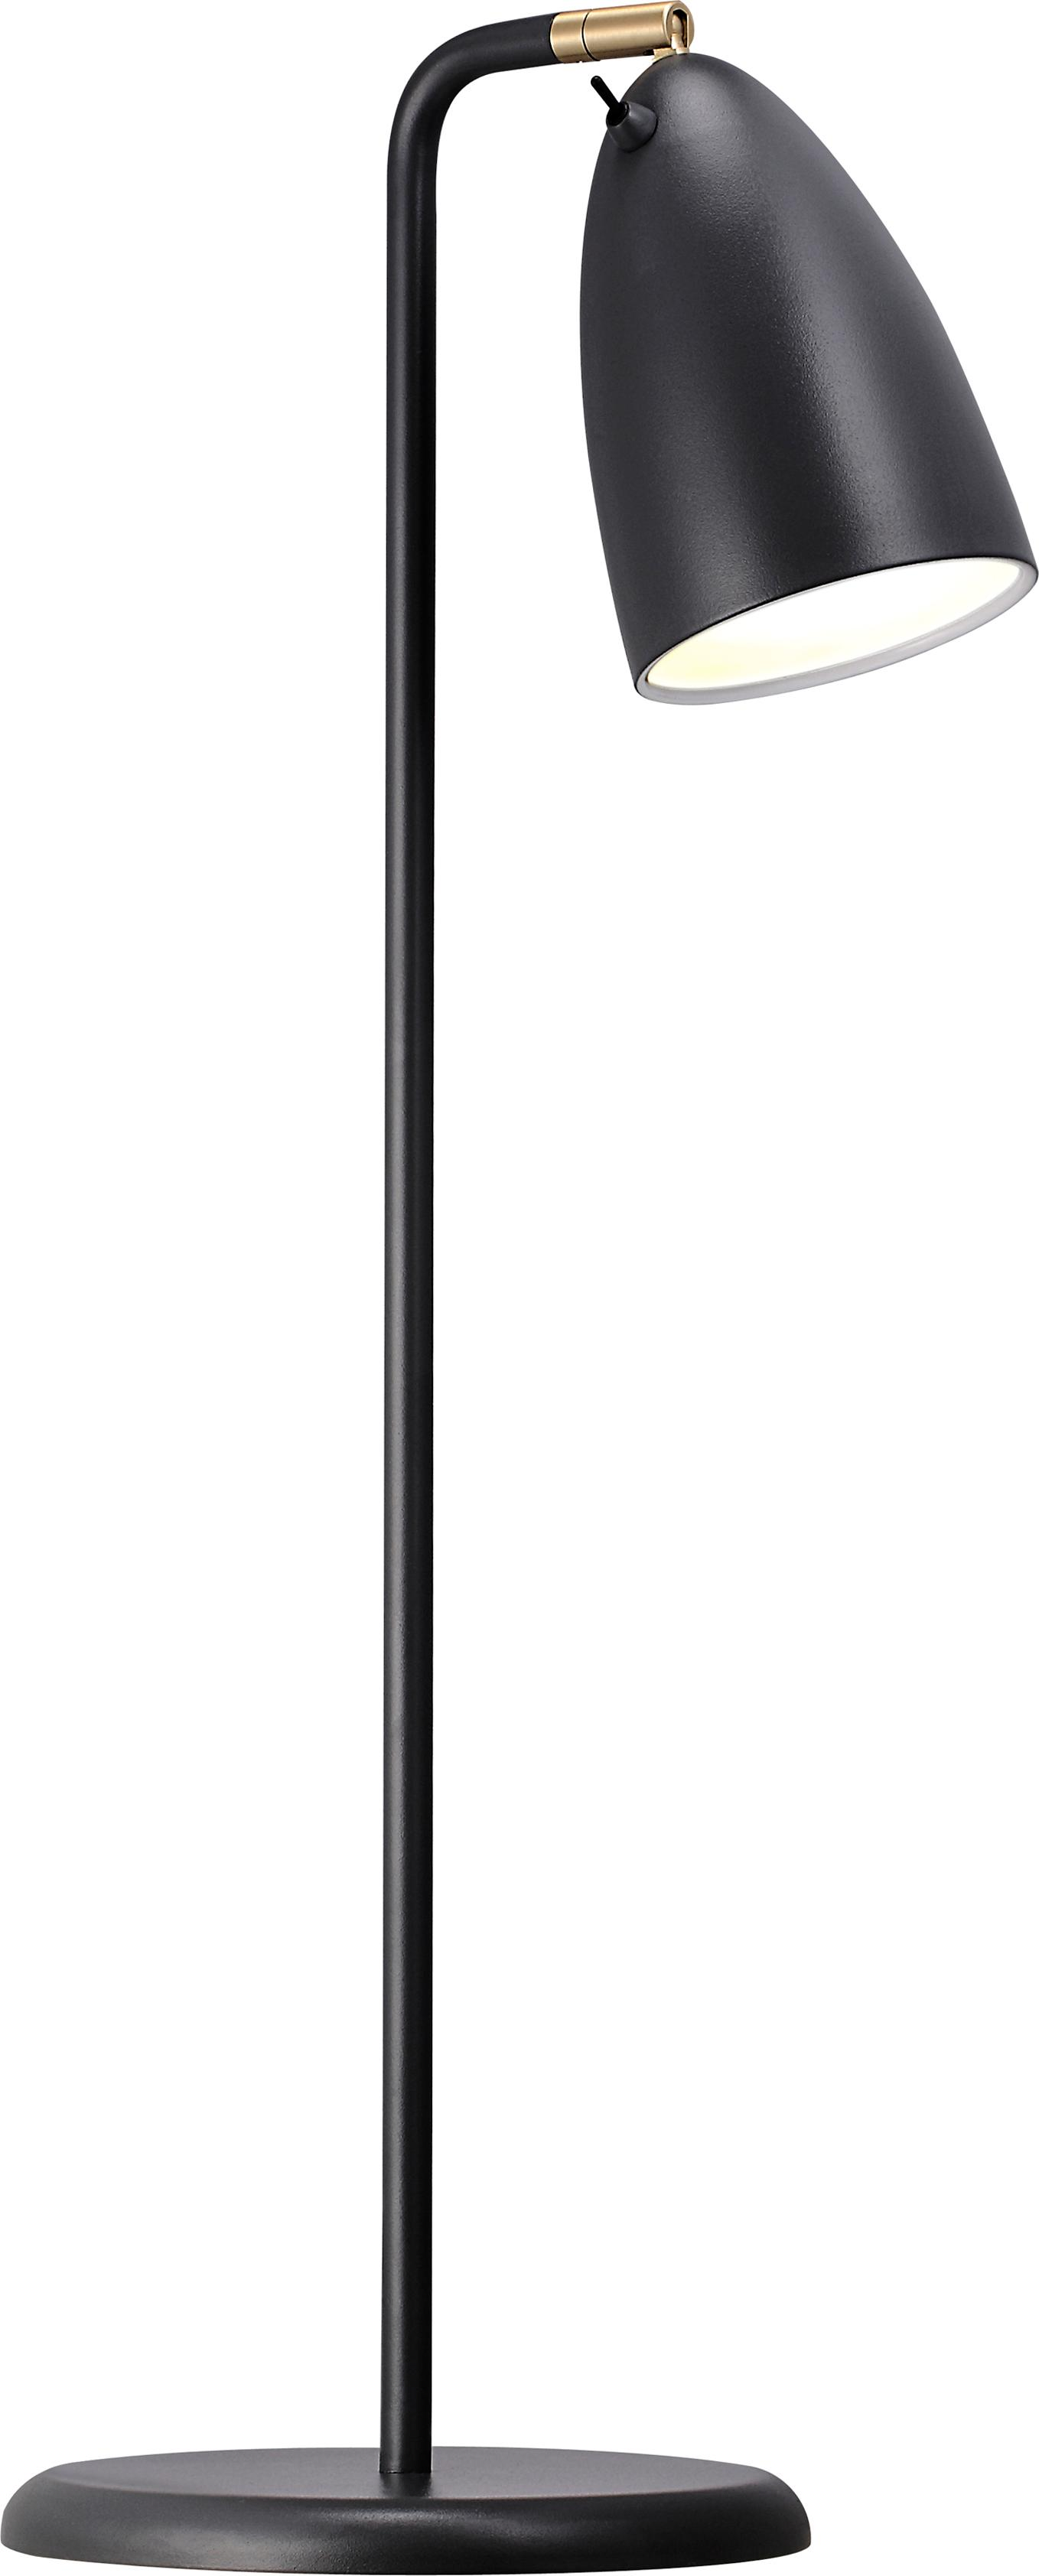 Tafellamp Nexus 10, Zwart, 28 x 63 cm